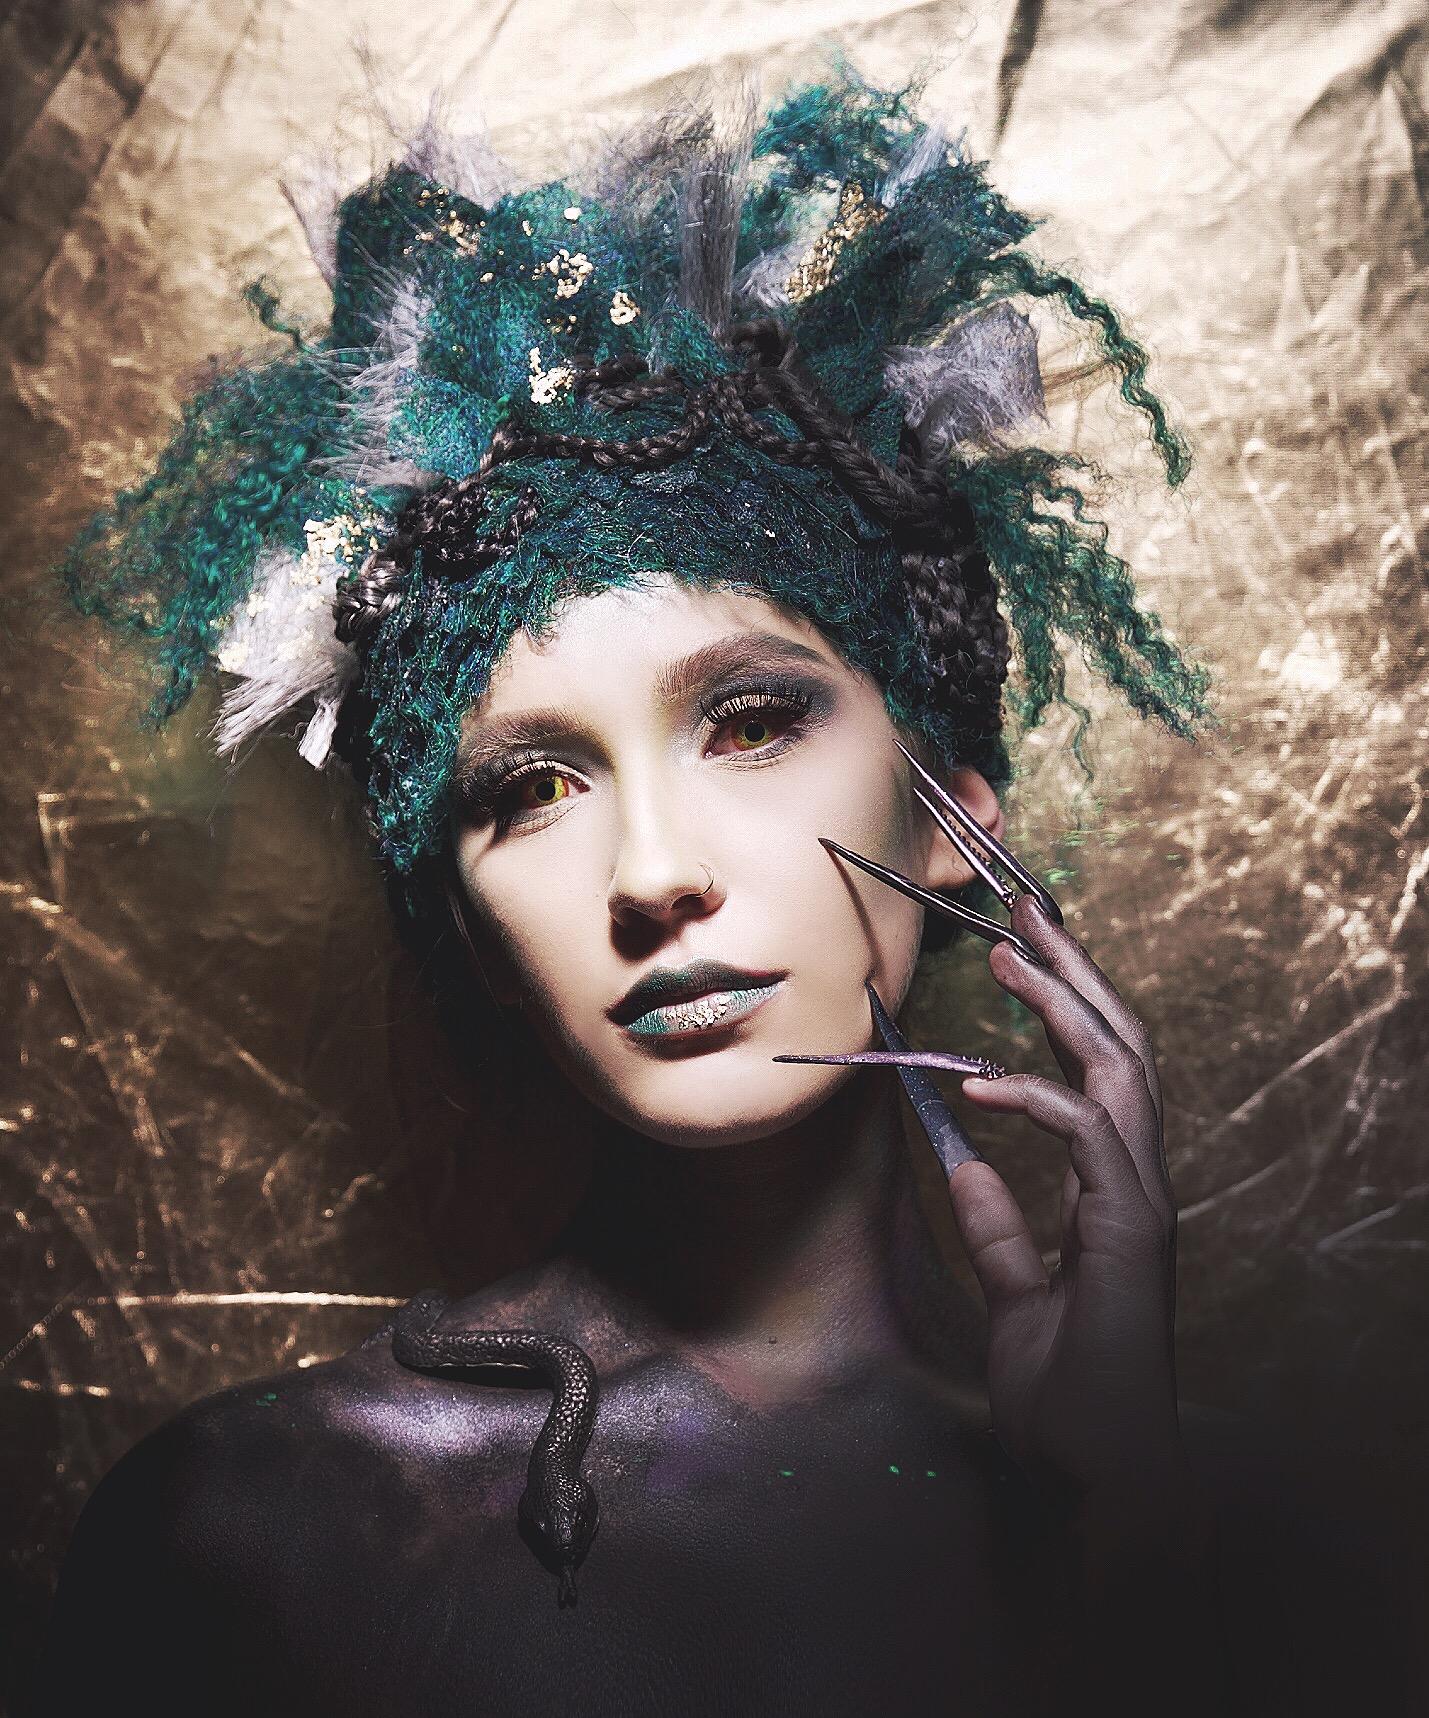 Avant Garde - Winner - Taylor Andrews Hairstyling Awards